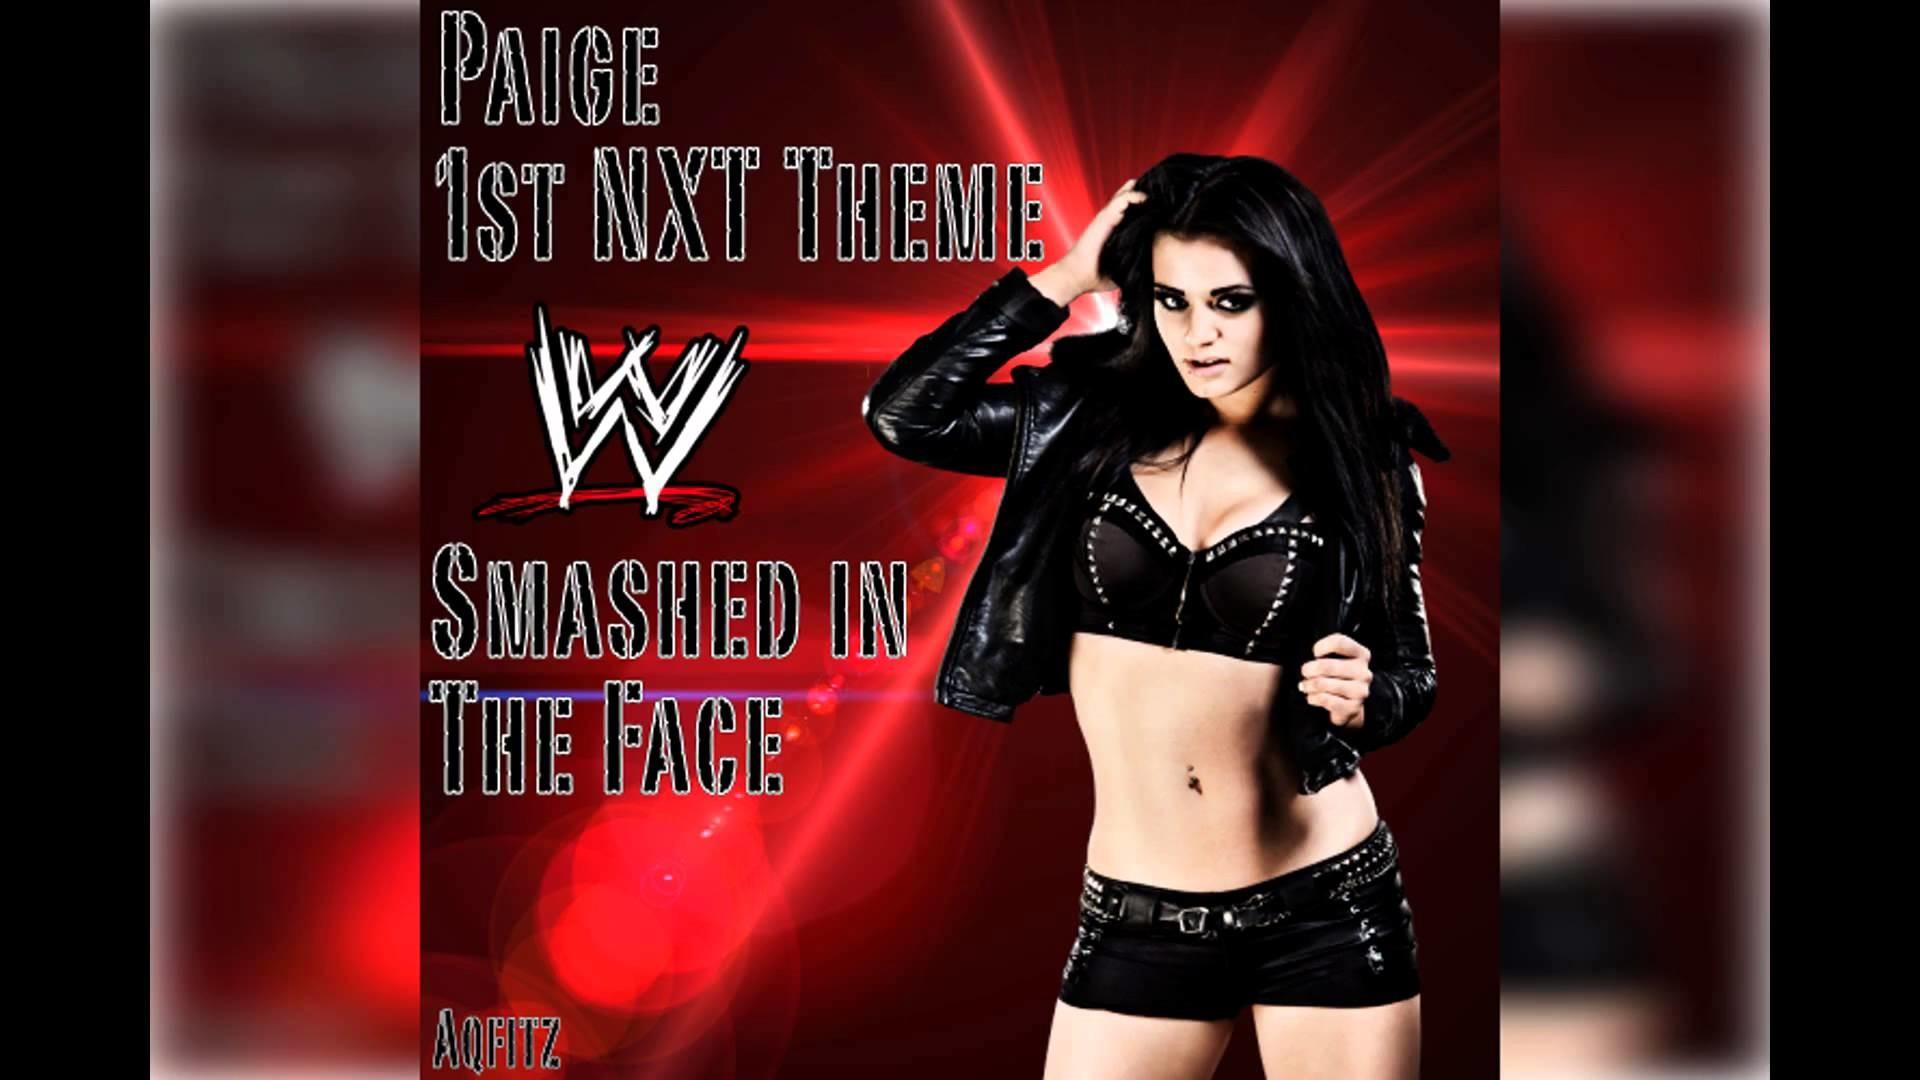 WWE Paige Theme (3 Minute Version)